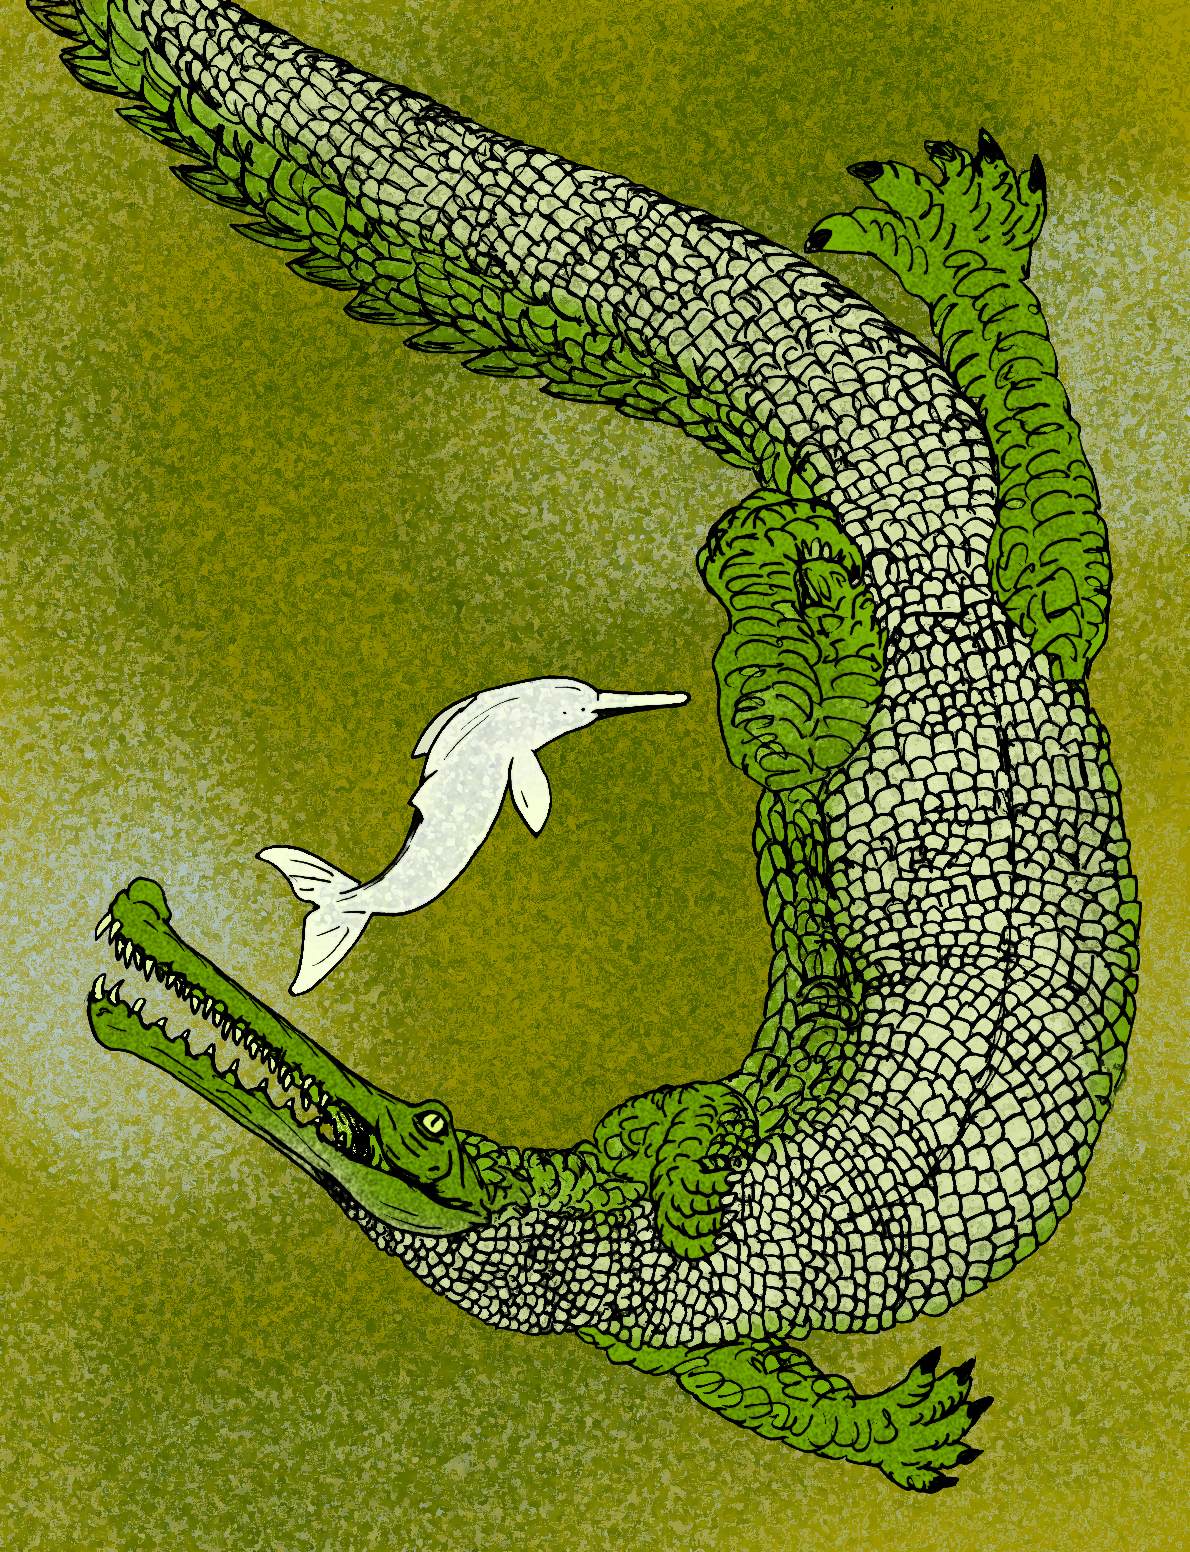 Rhamphosuchus - Wikipedia